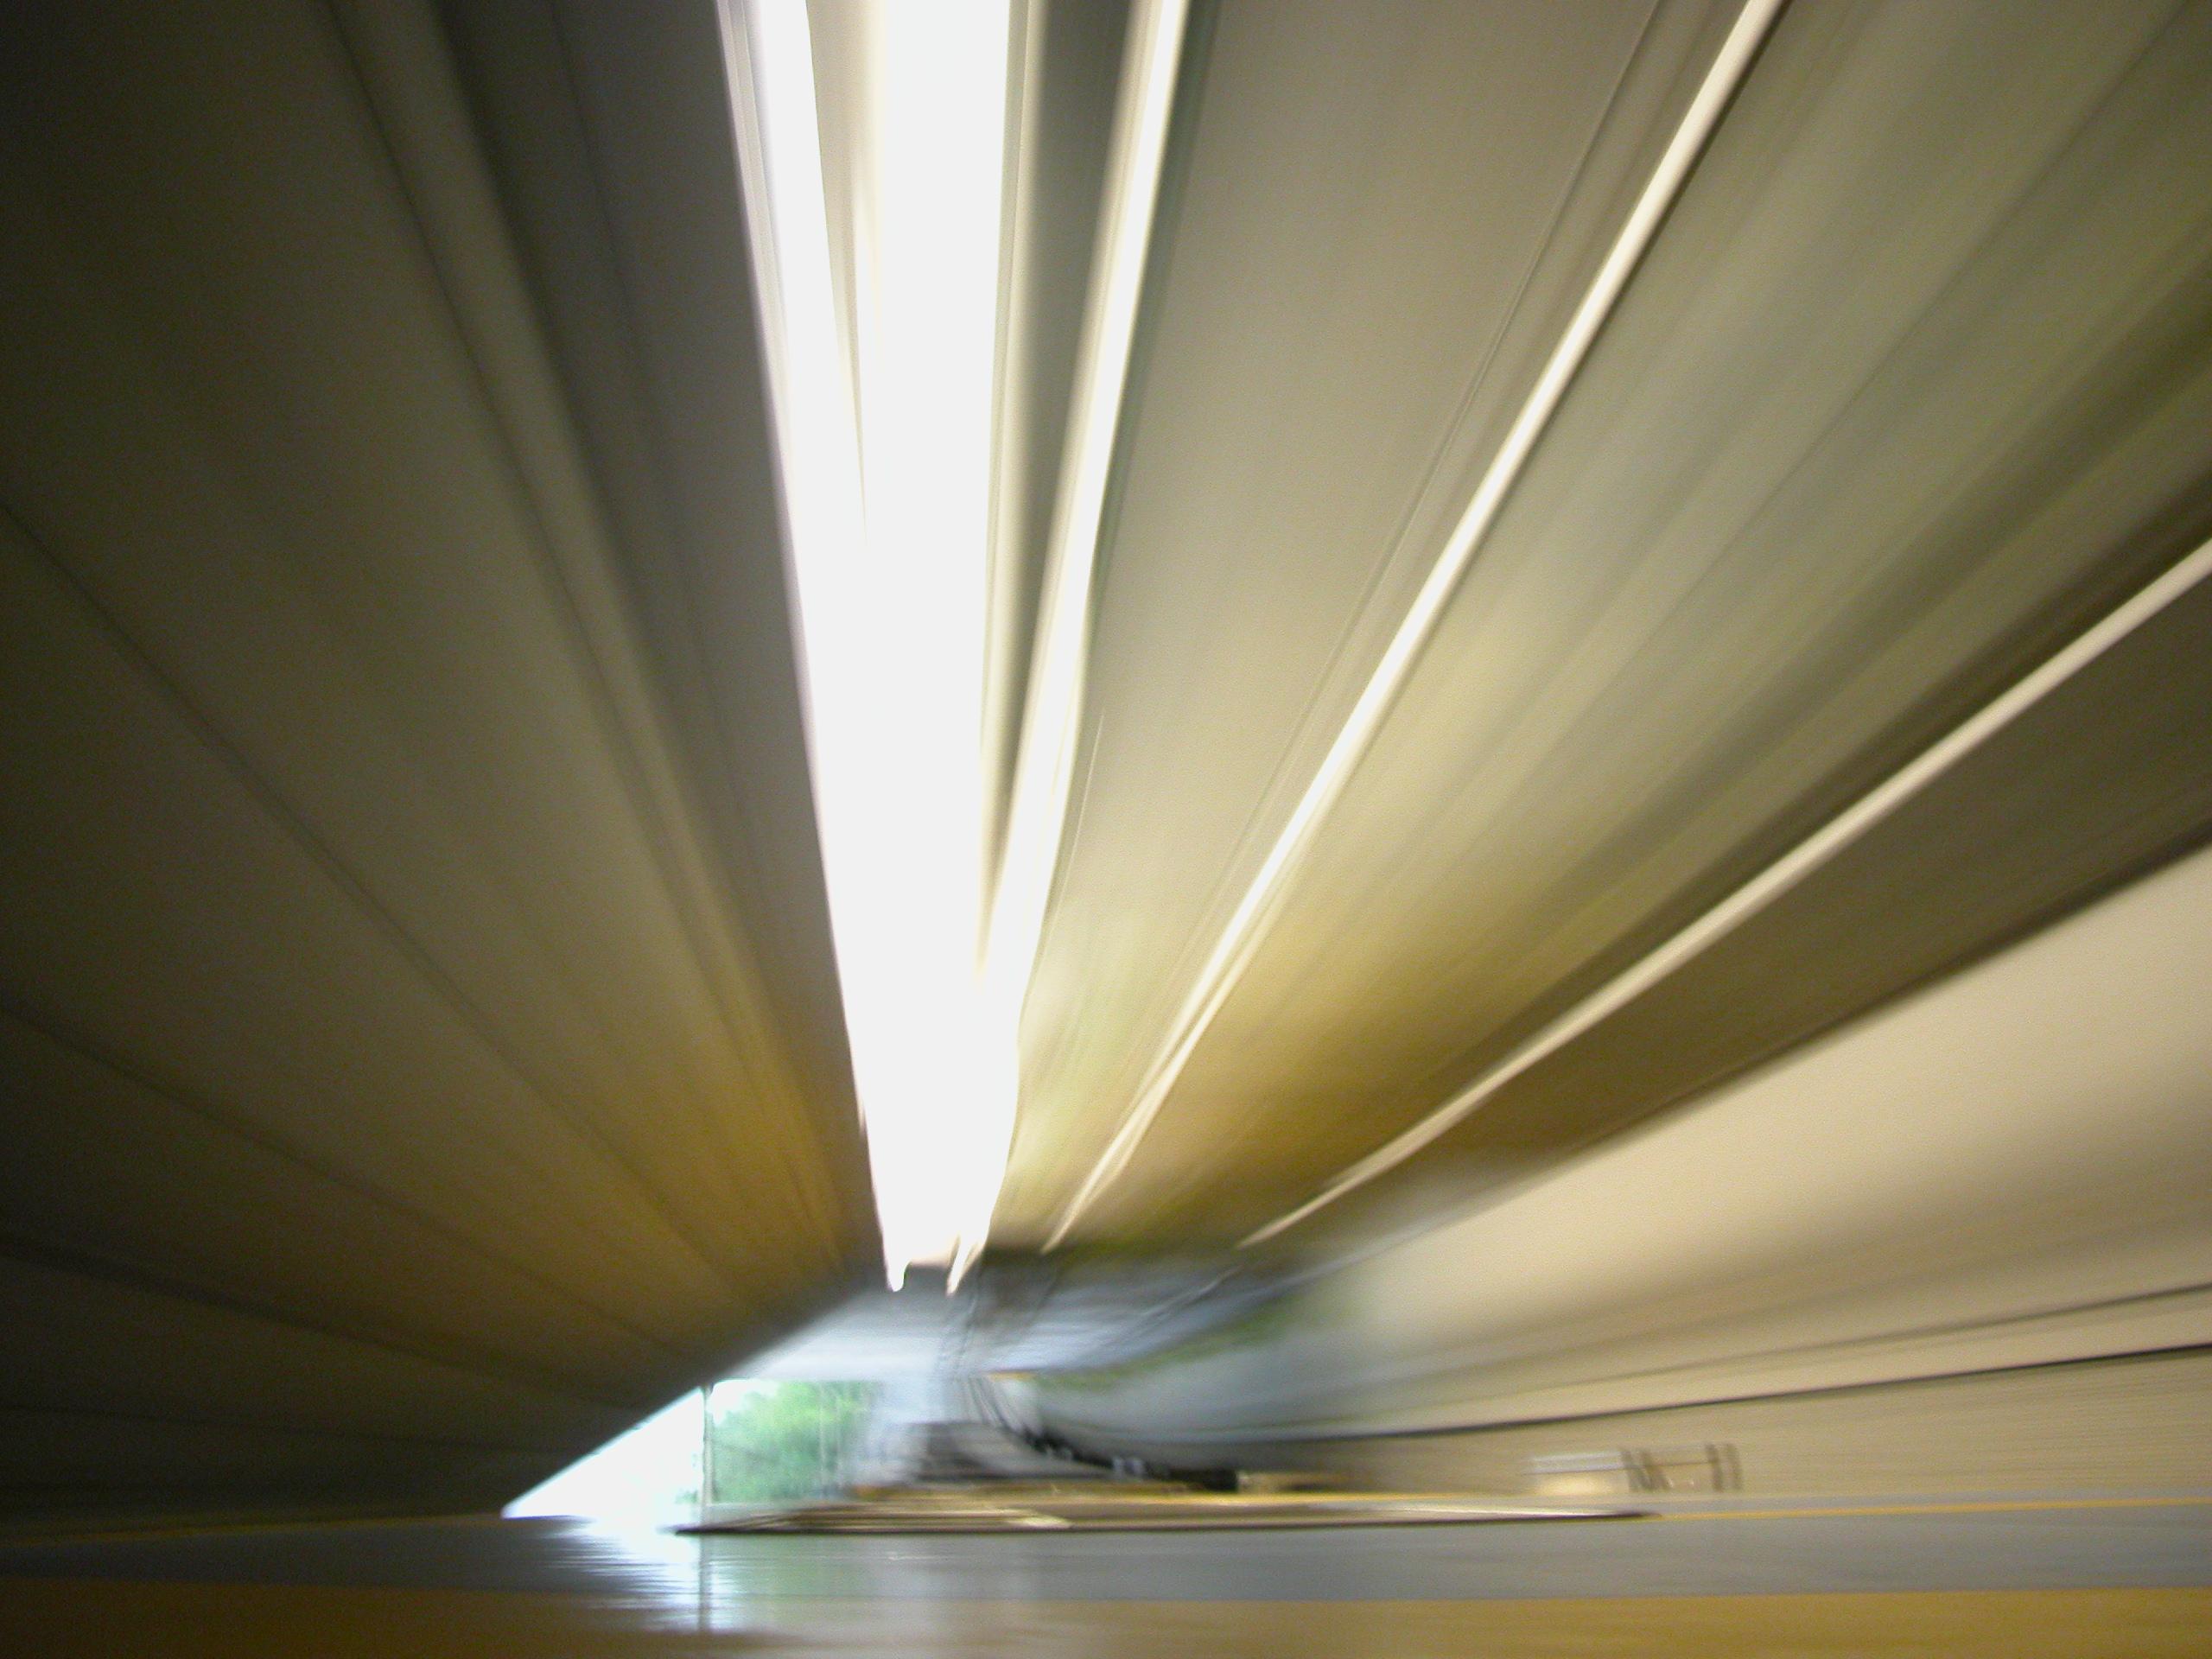 speed tunnel yellow light beams